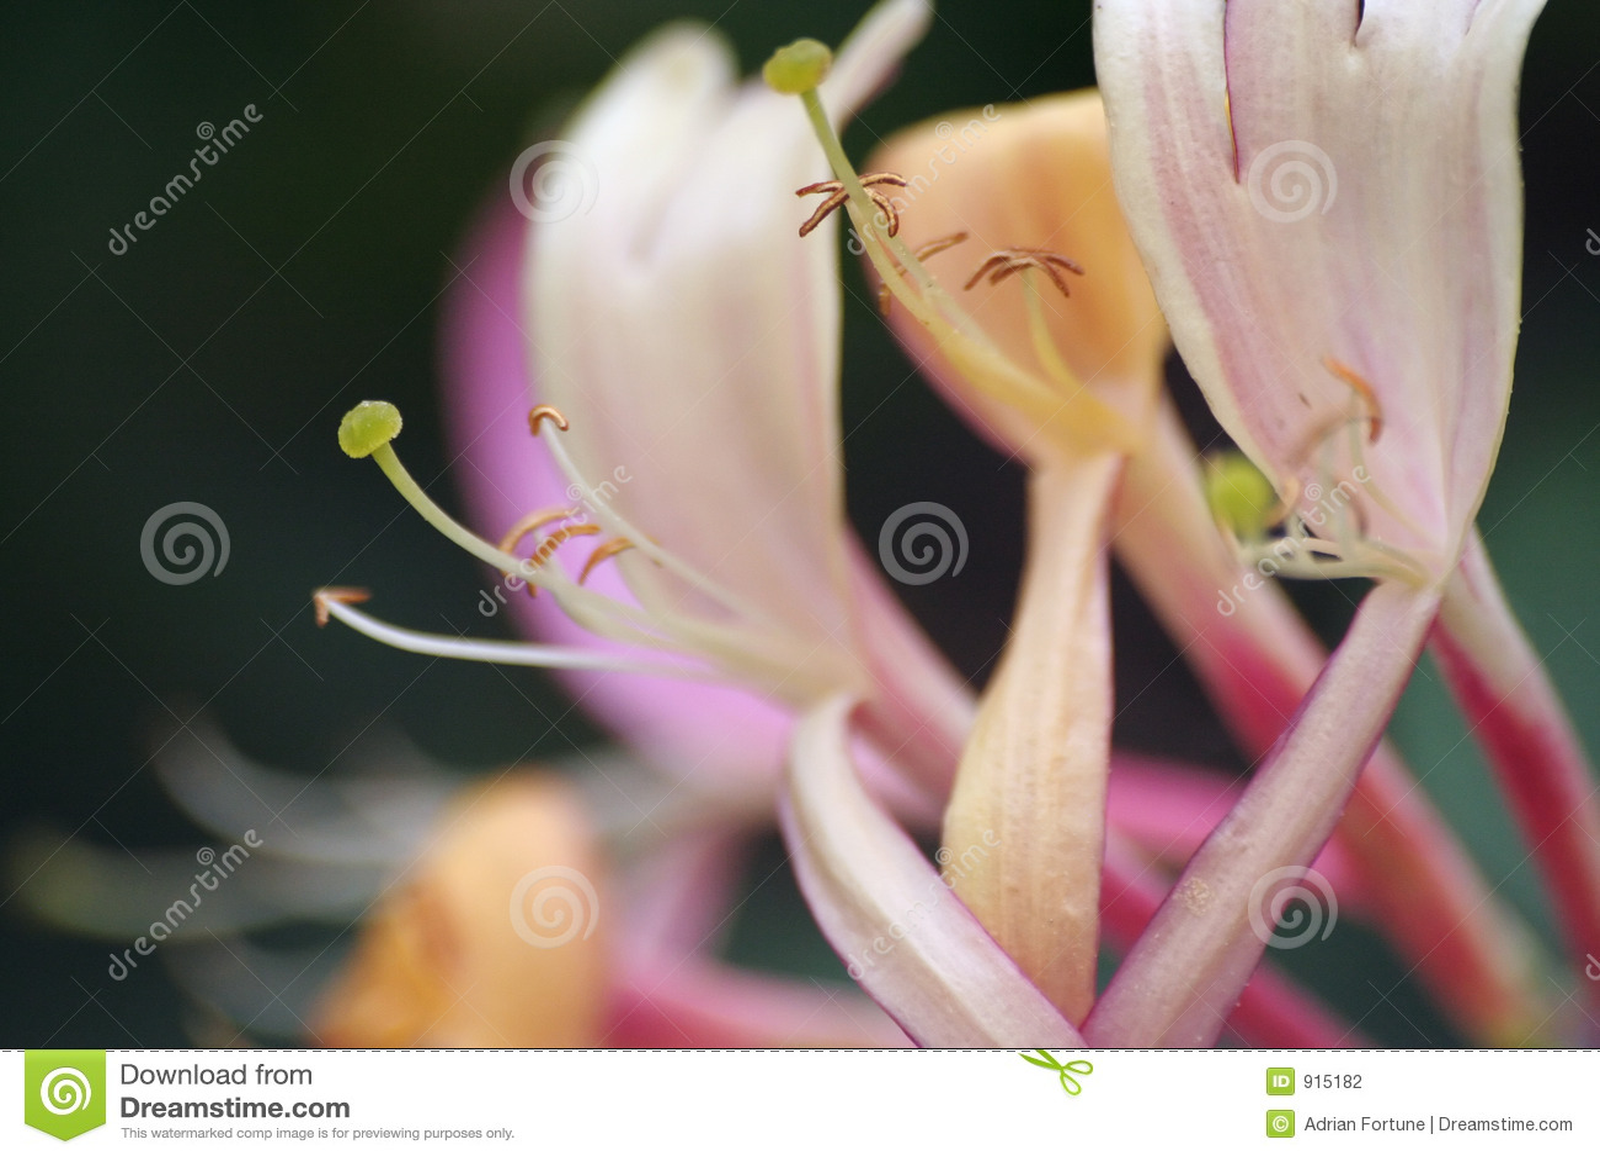 Honeysuckle flower,shallow dof,(Lonicera periclymenum Serotina)